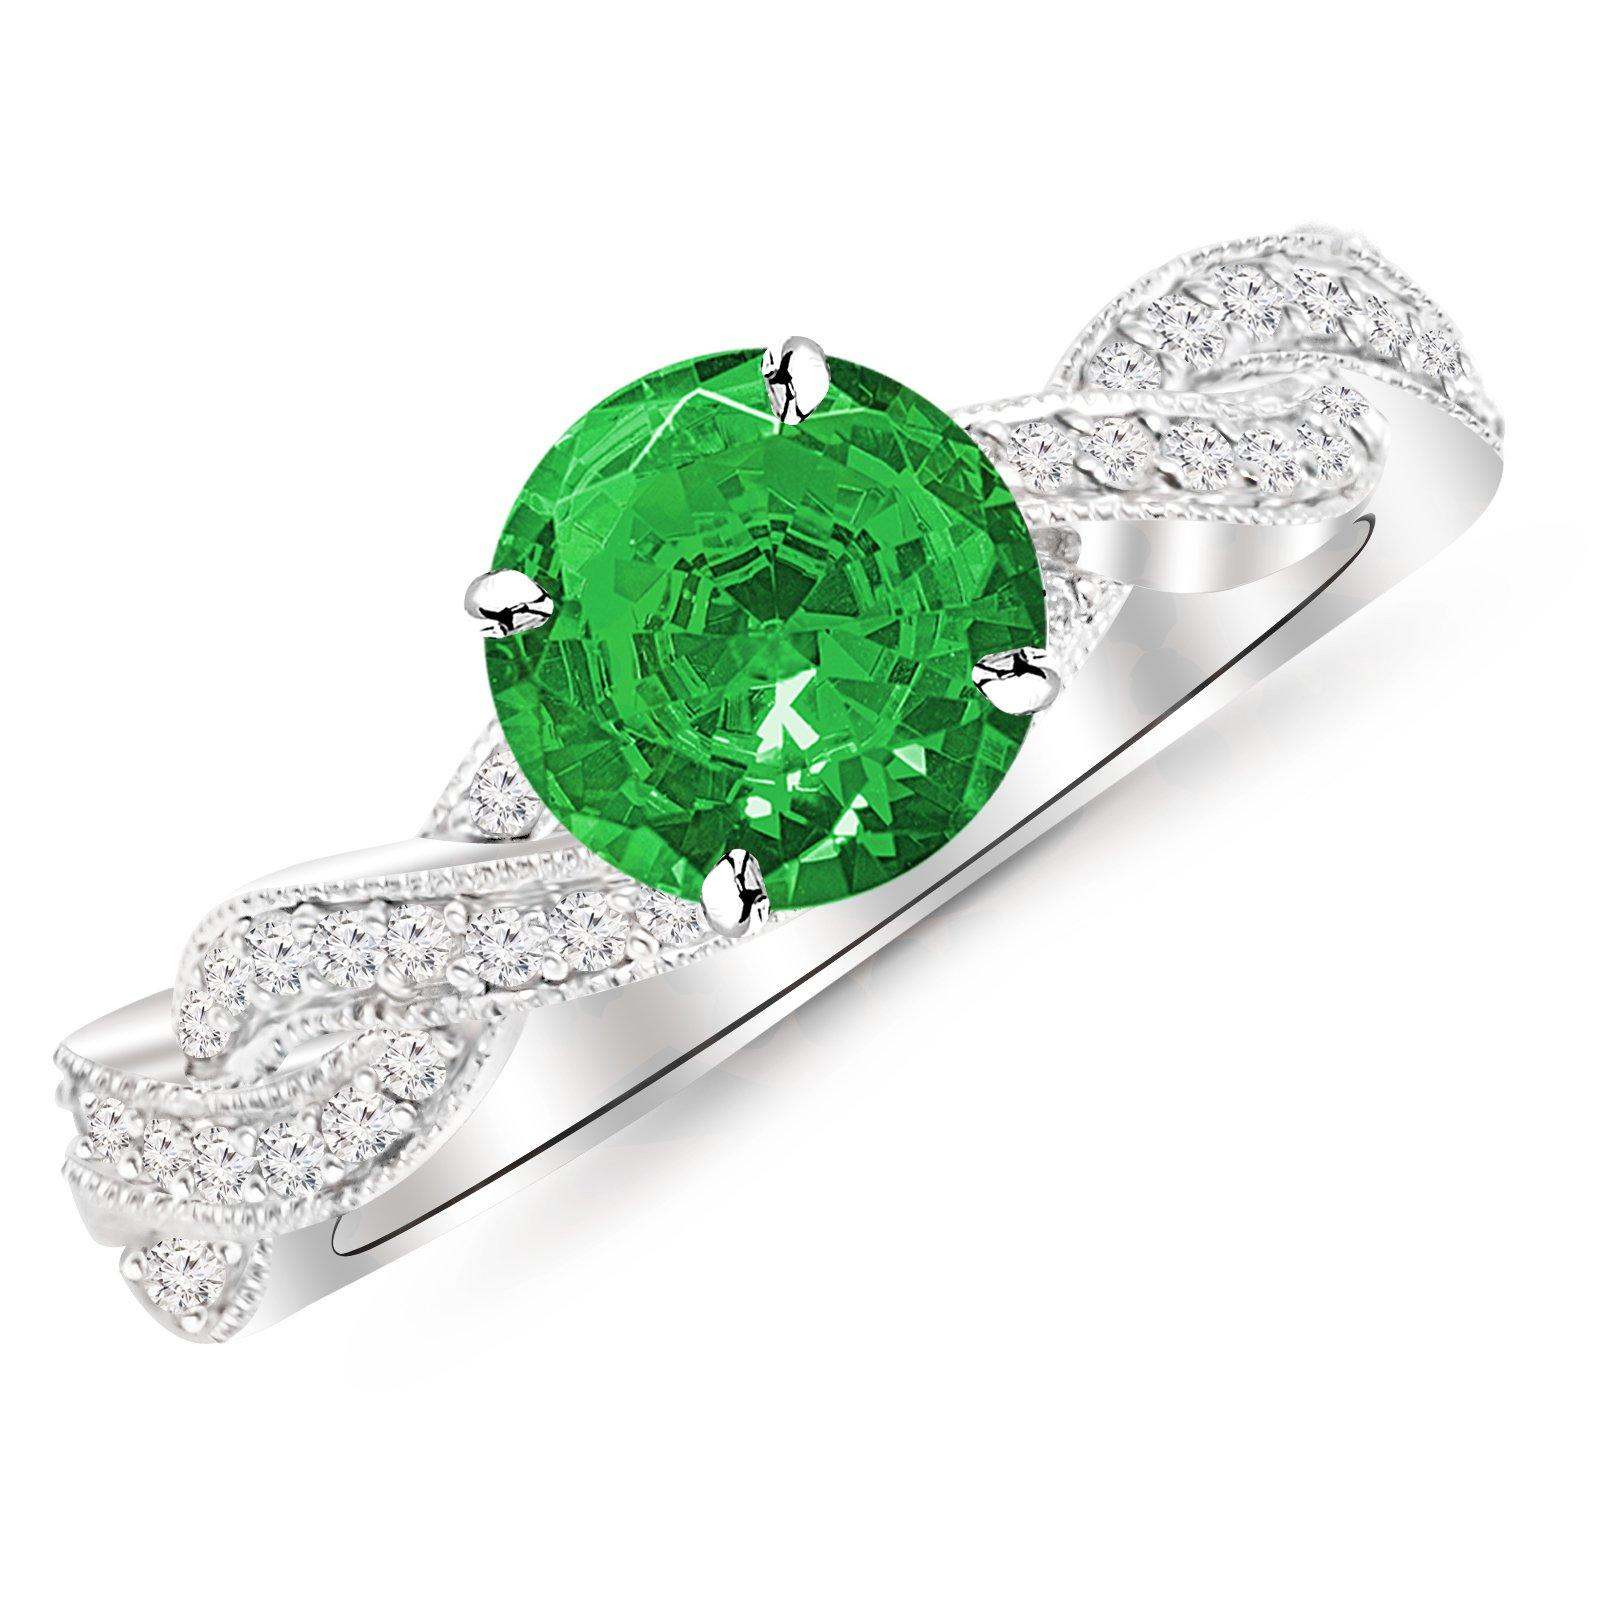 Platinum Vintage Eternity Love Twisting Split Shank Diamond Engagement Ring With Milgrain with a 0.5 Carat Emerald Heirloom Quality Center